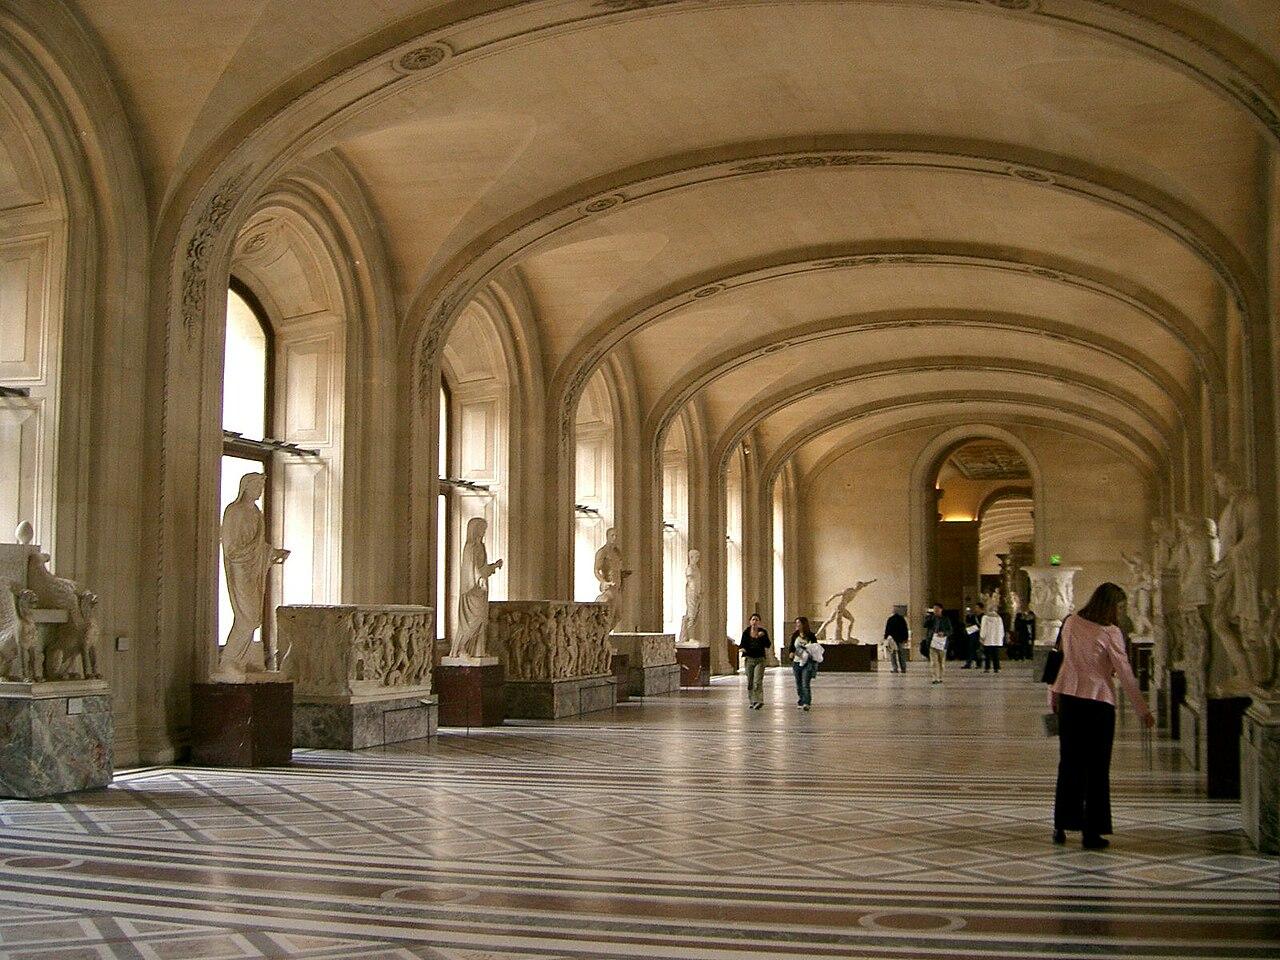 File:Inside the Musée de Louvre, 12 May 2004.jpg ...